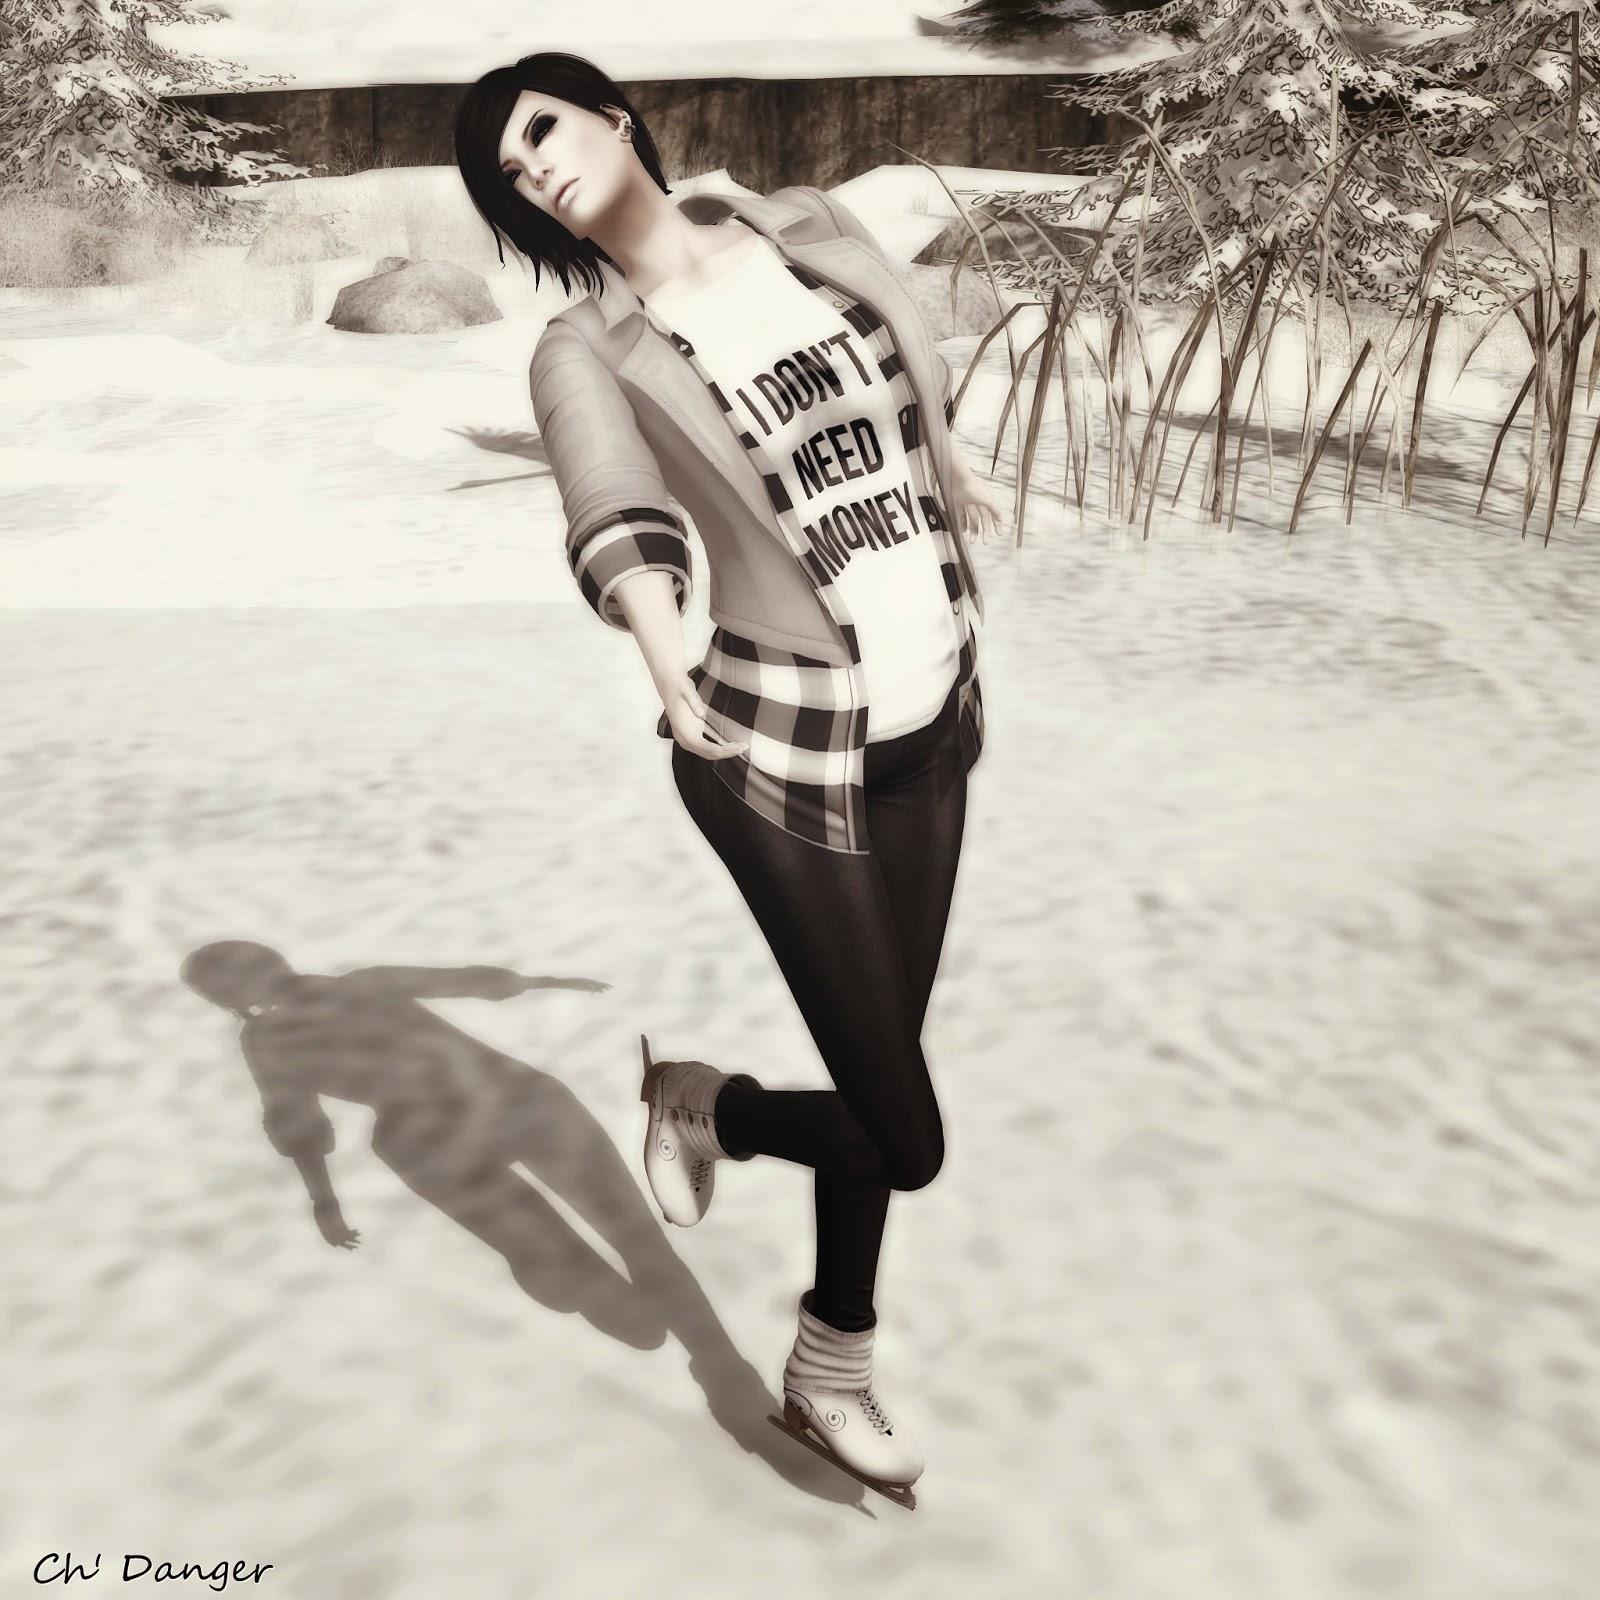 https://www.flickr.com/photos/123568241@N04/15893437248/in/photostream/lightbox/